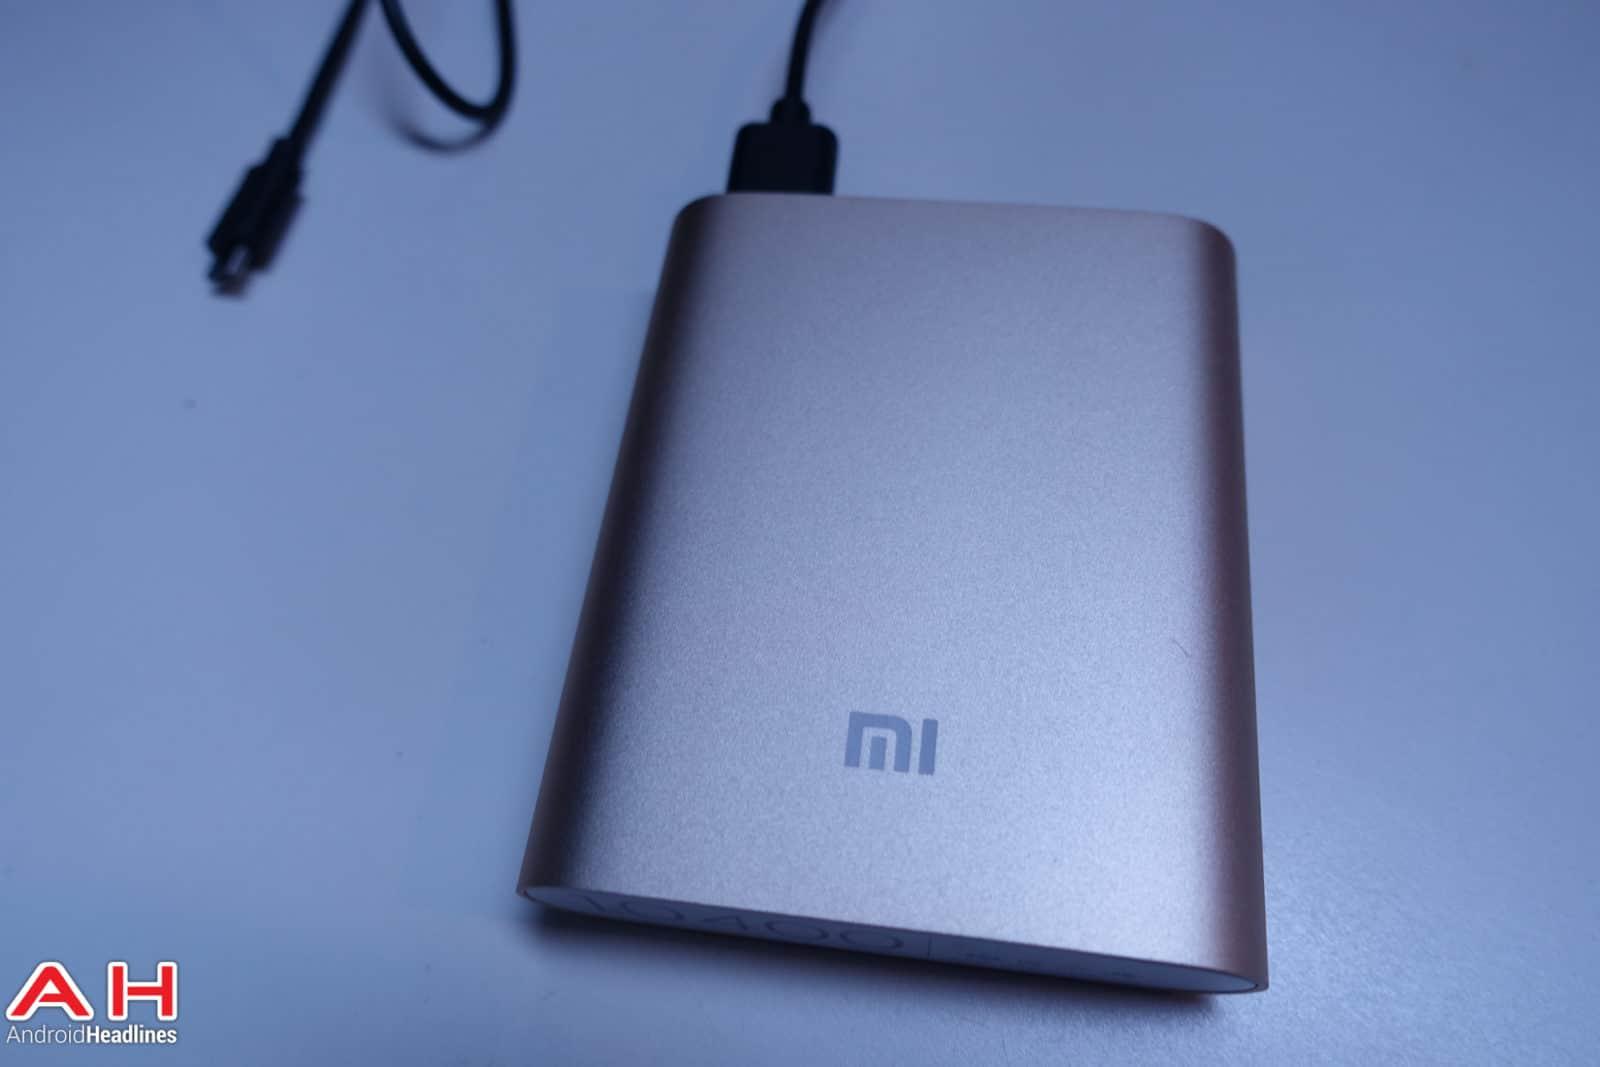 Xiaomi-Mi-Power-Bank-AH-03844